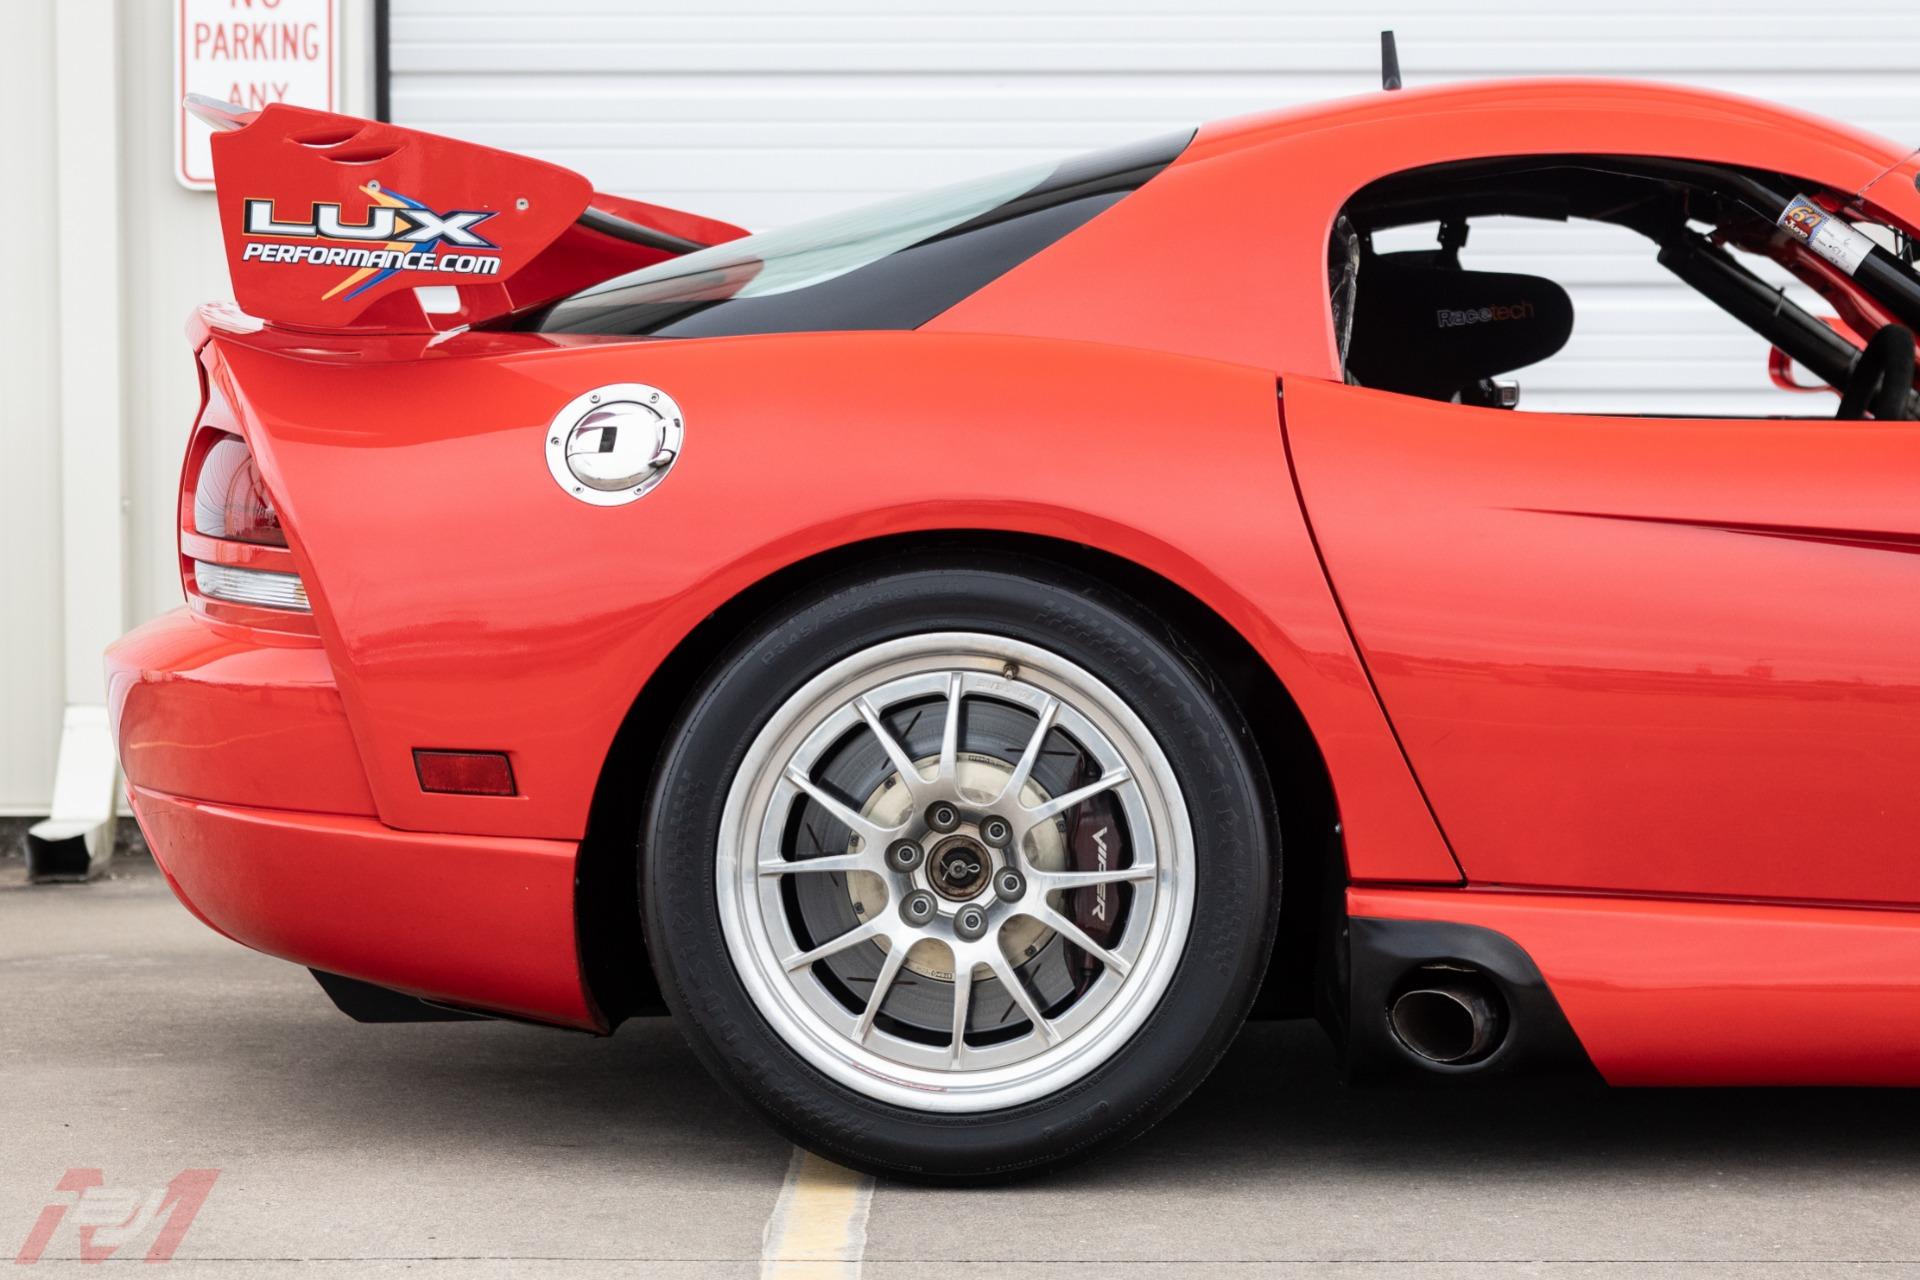 Used-2010-Dodge-Viper-ACR-X--16-of-50